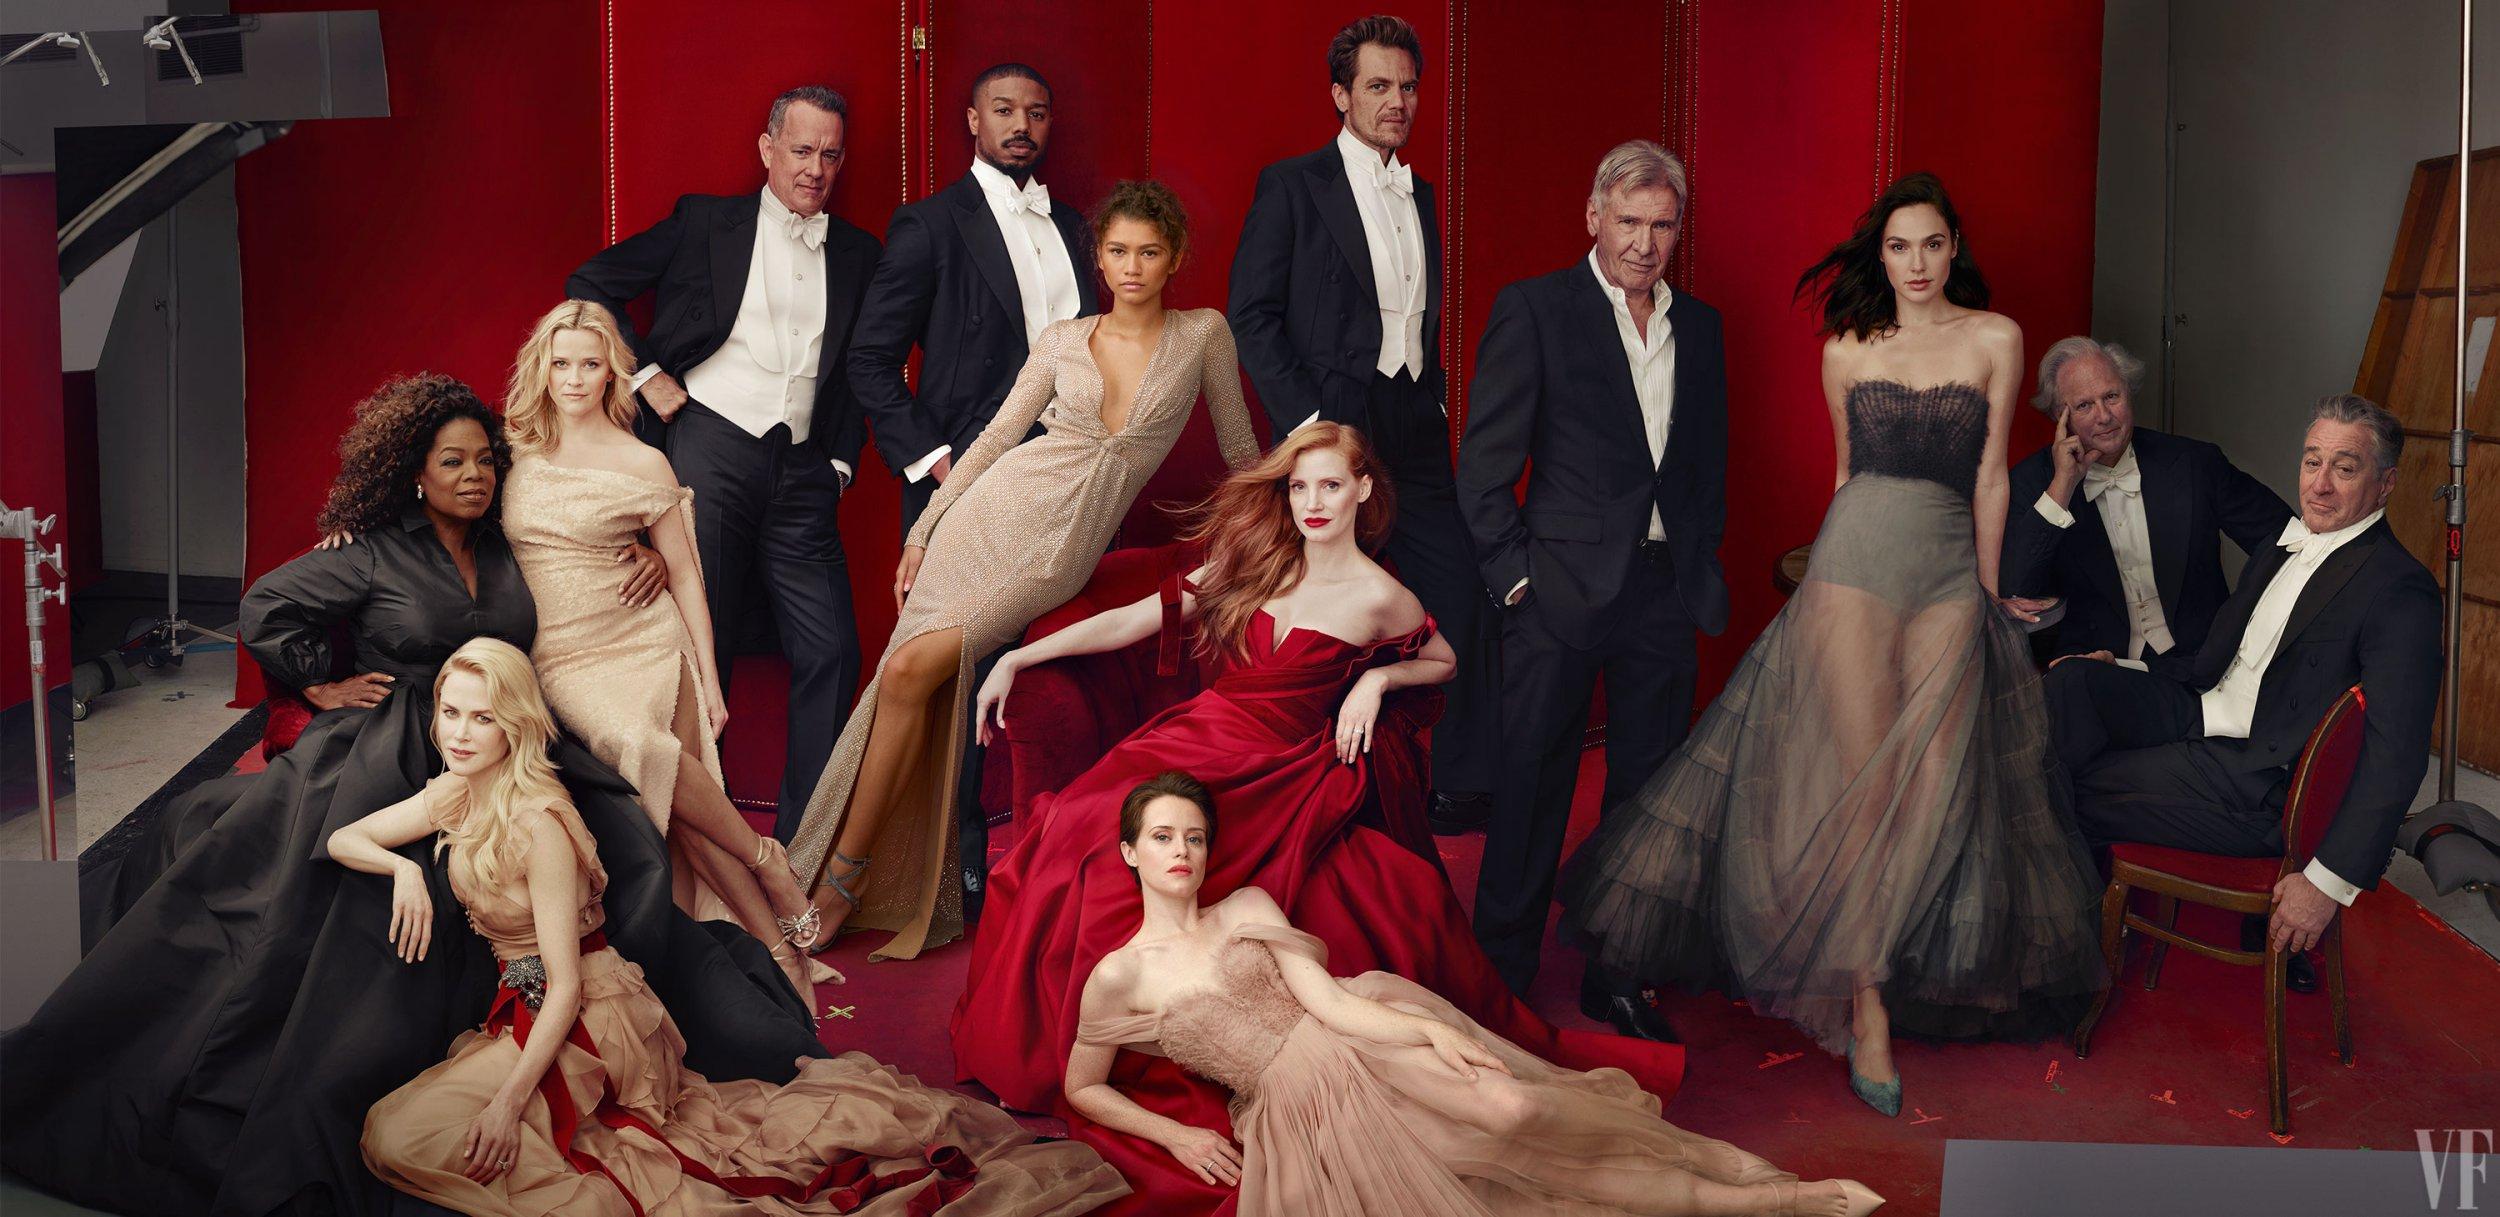 Vanity Fair foldout cover